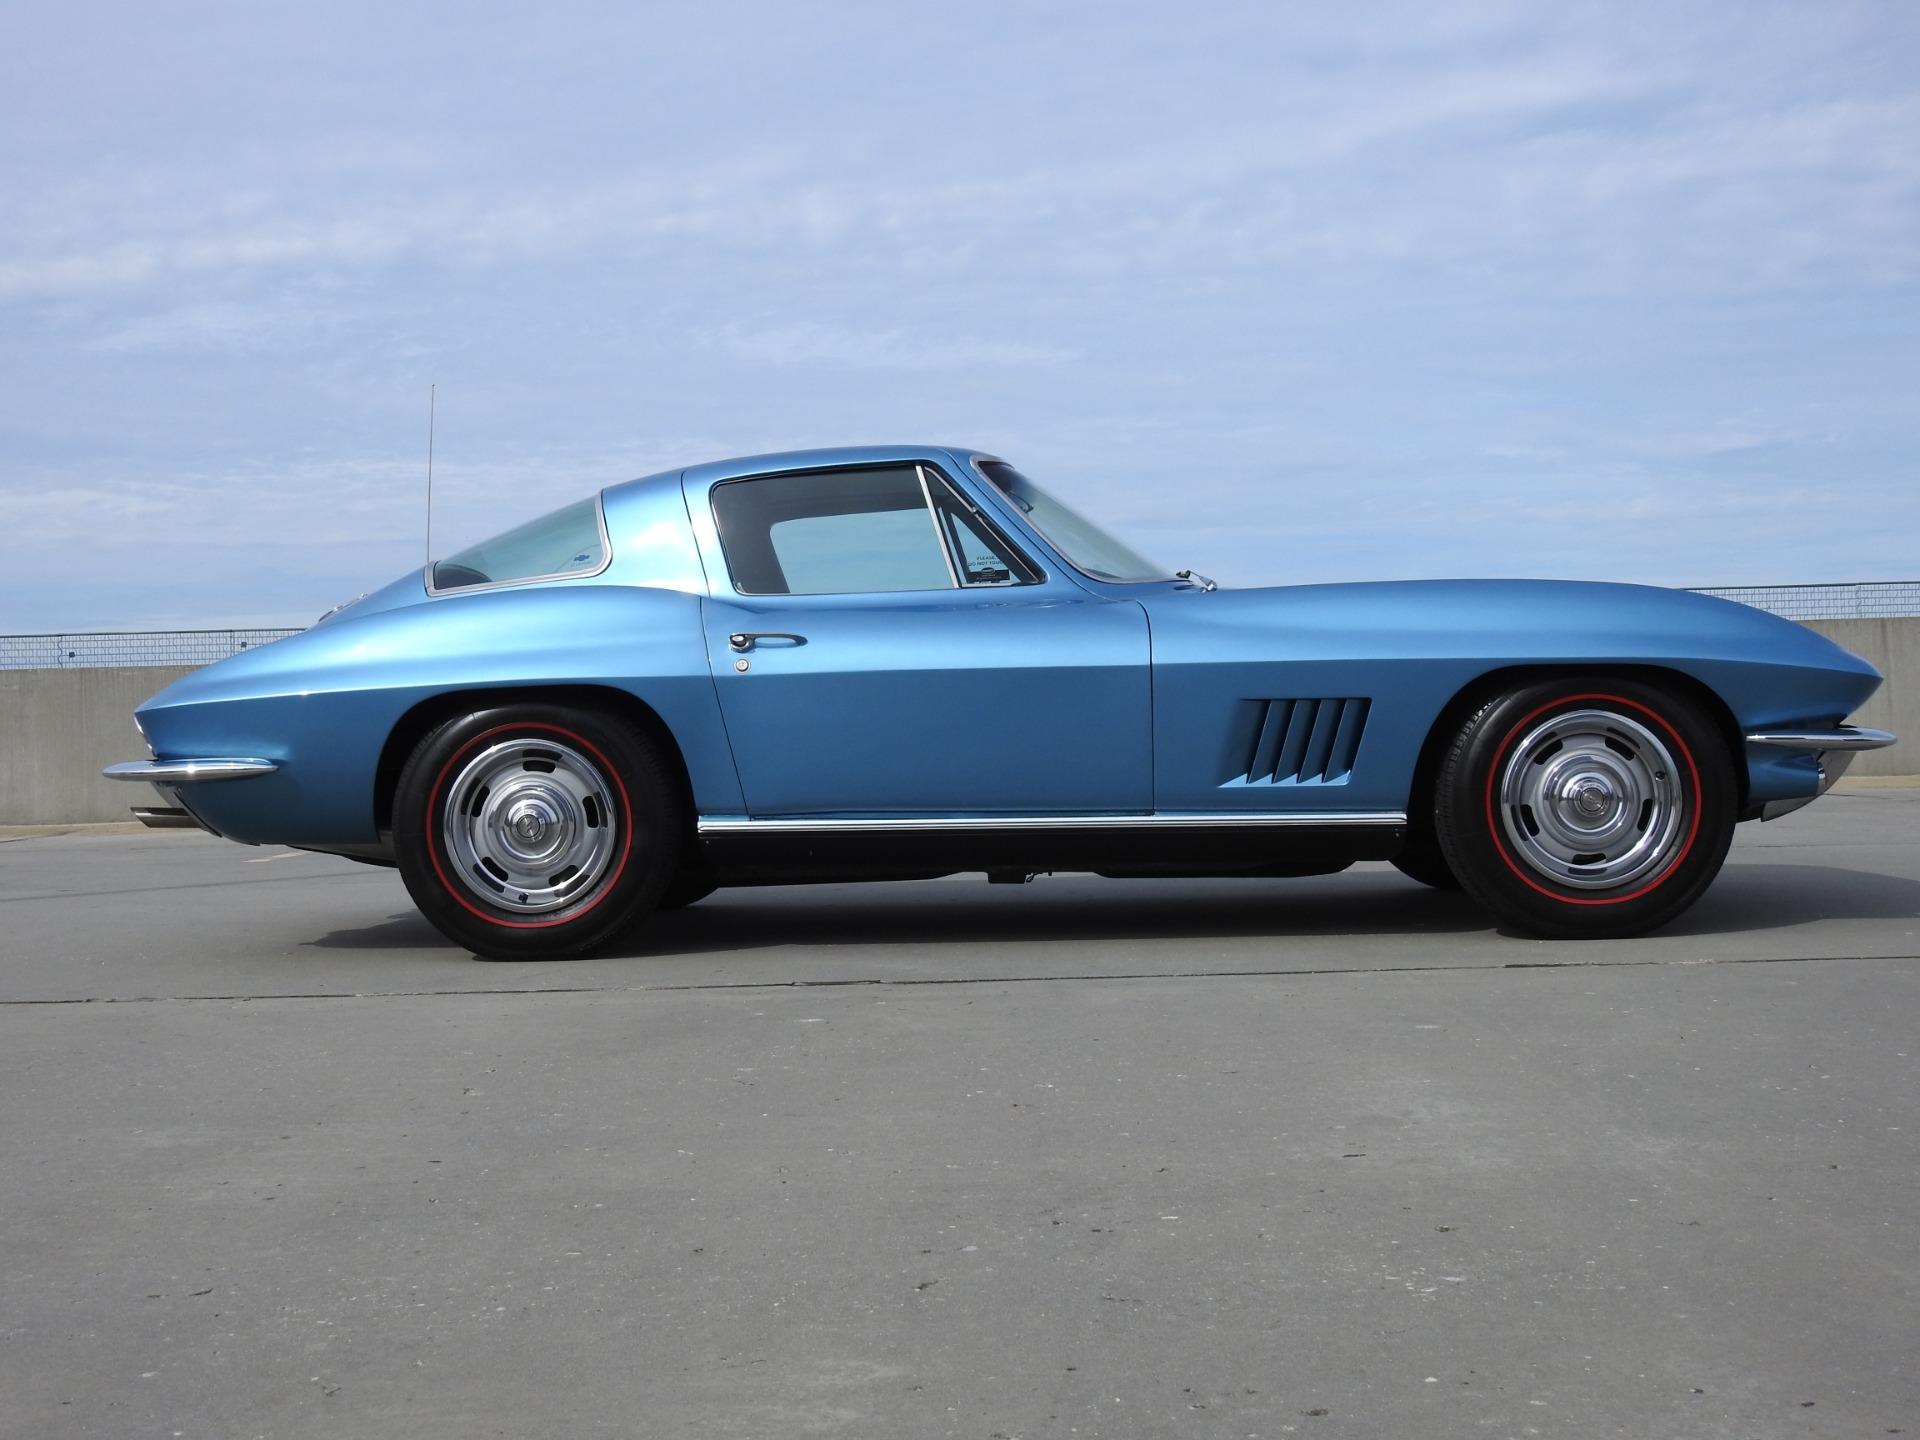 Used-1967-Chevrolet-Corvette-Coupe-L79-**-67000-Original-Miles-**-for-sale-Jackson-MS